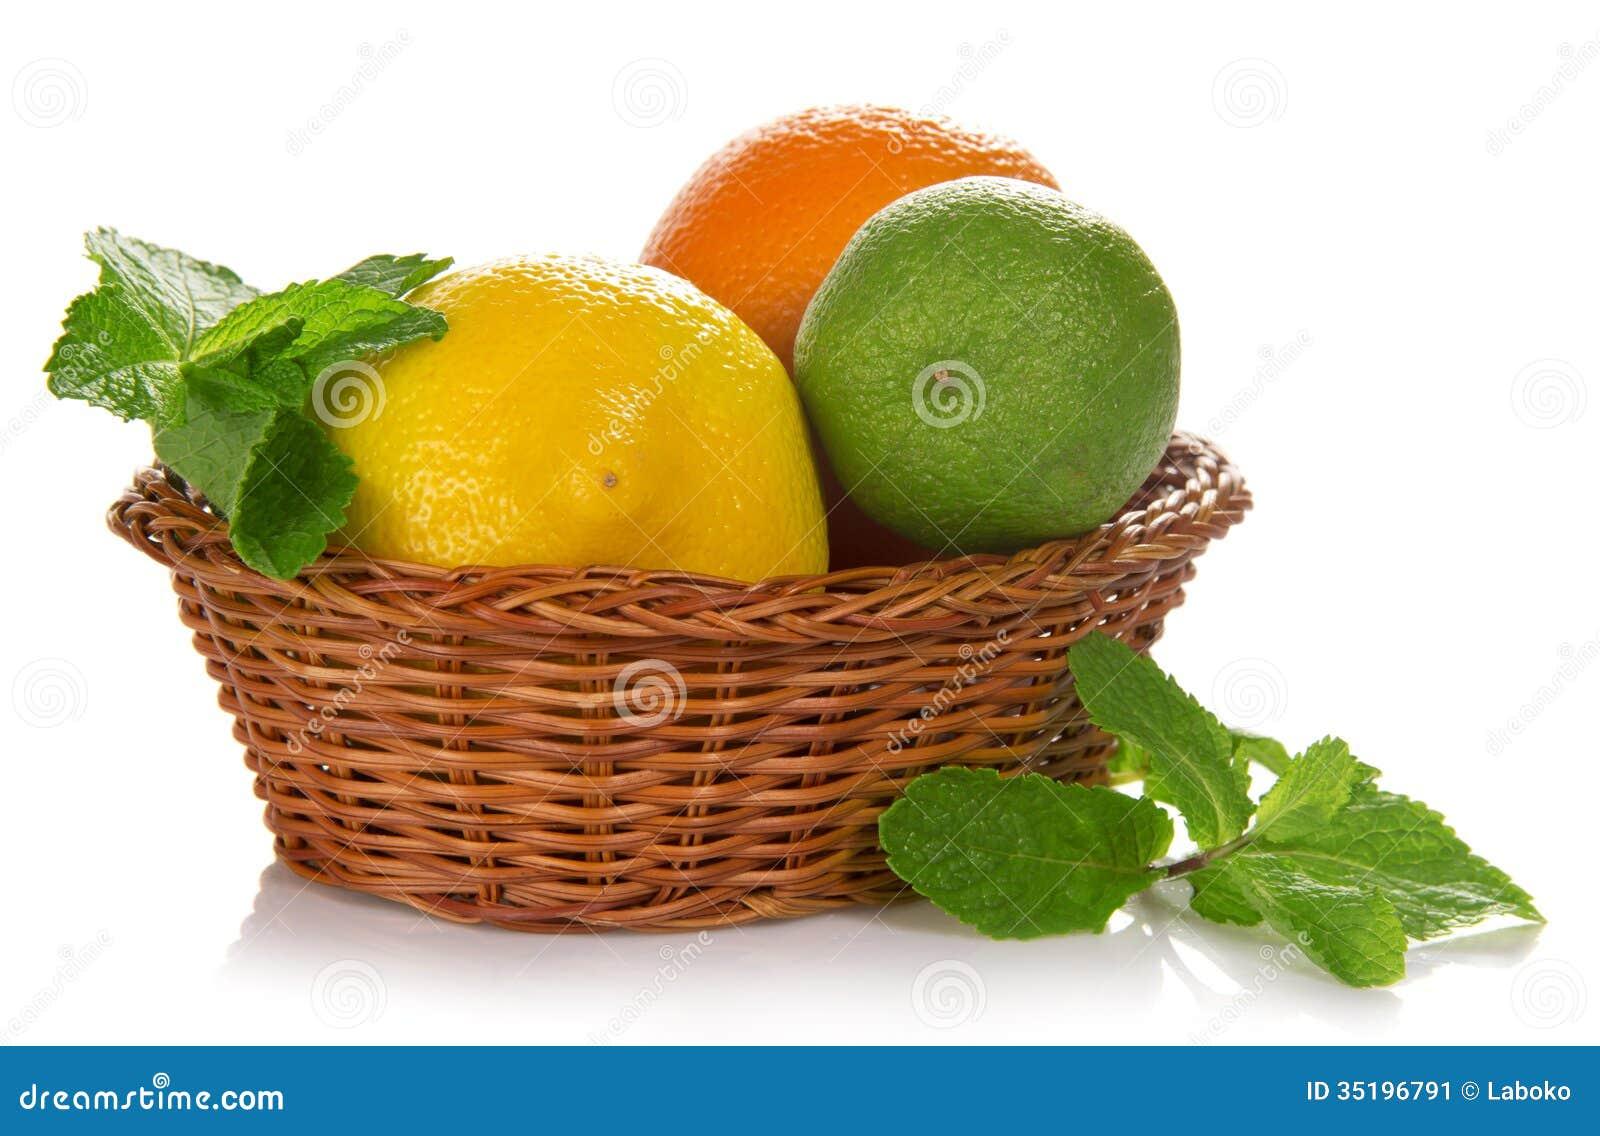 Fruits basket lemon threesome